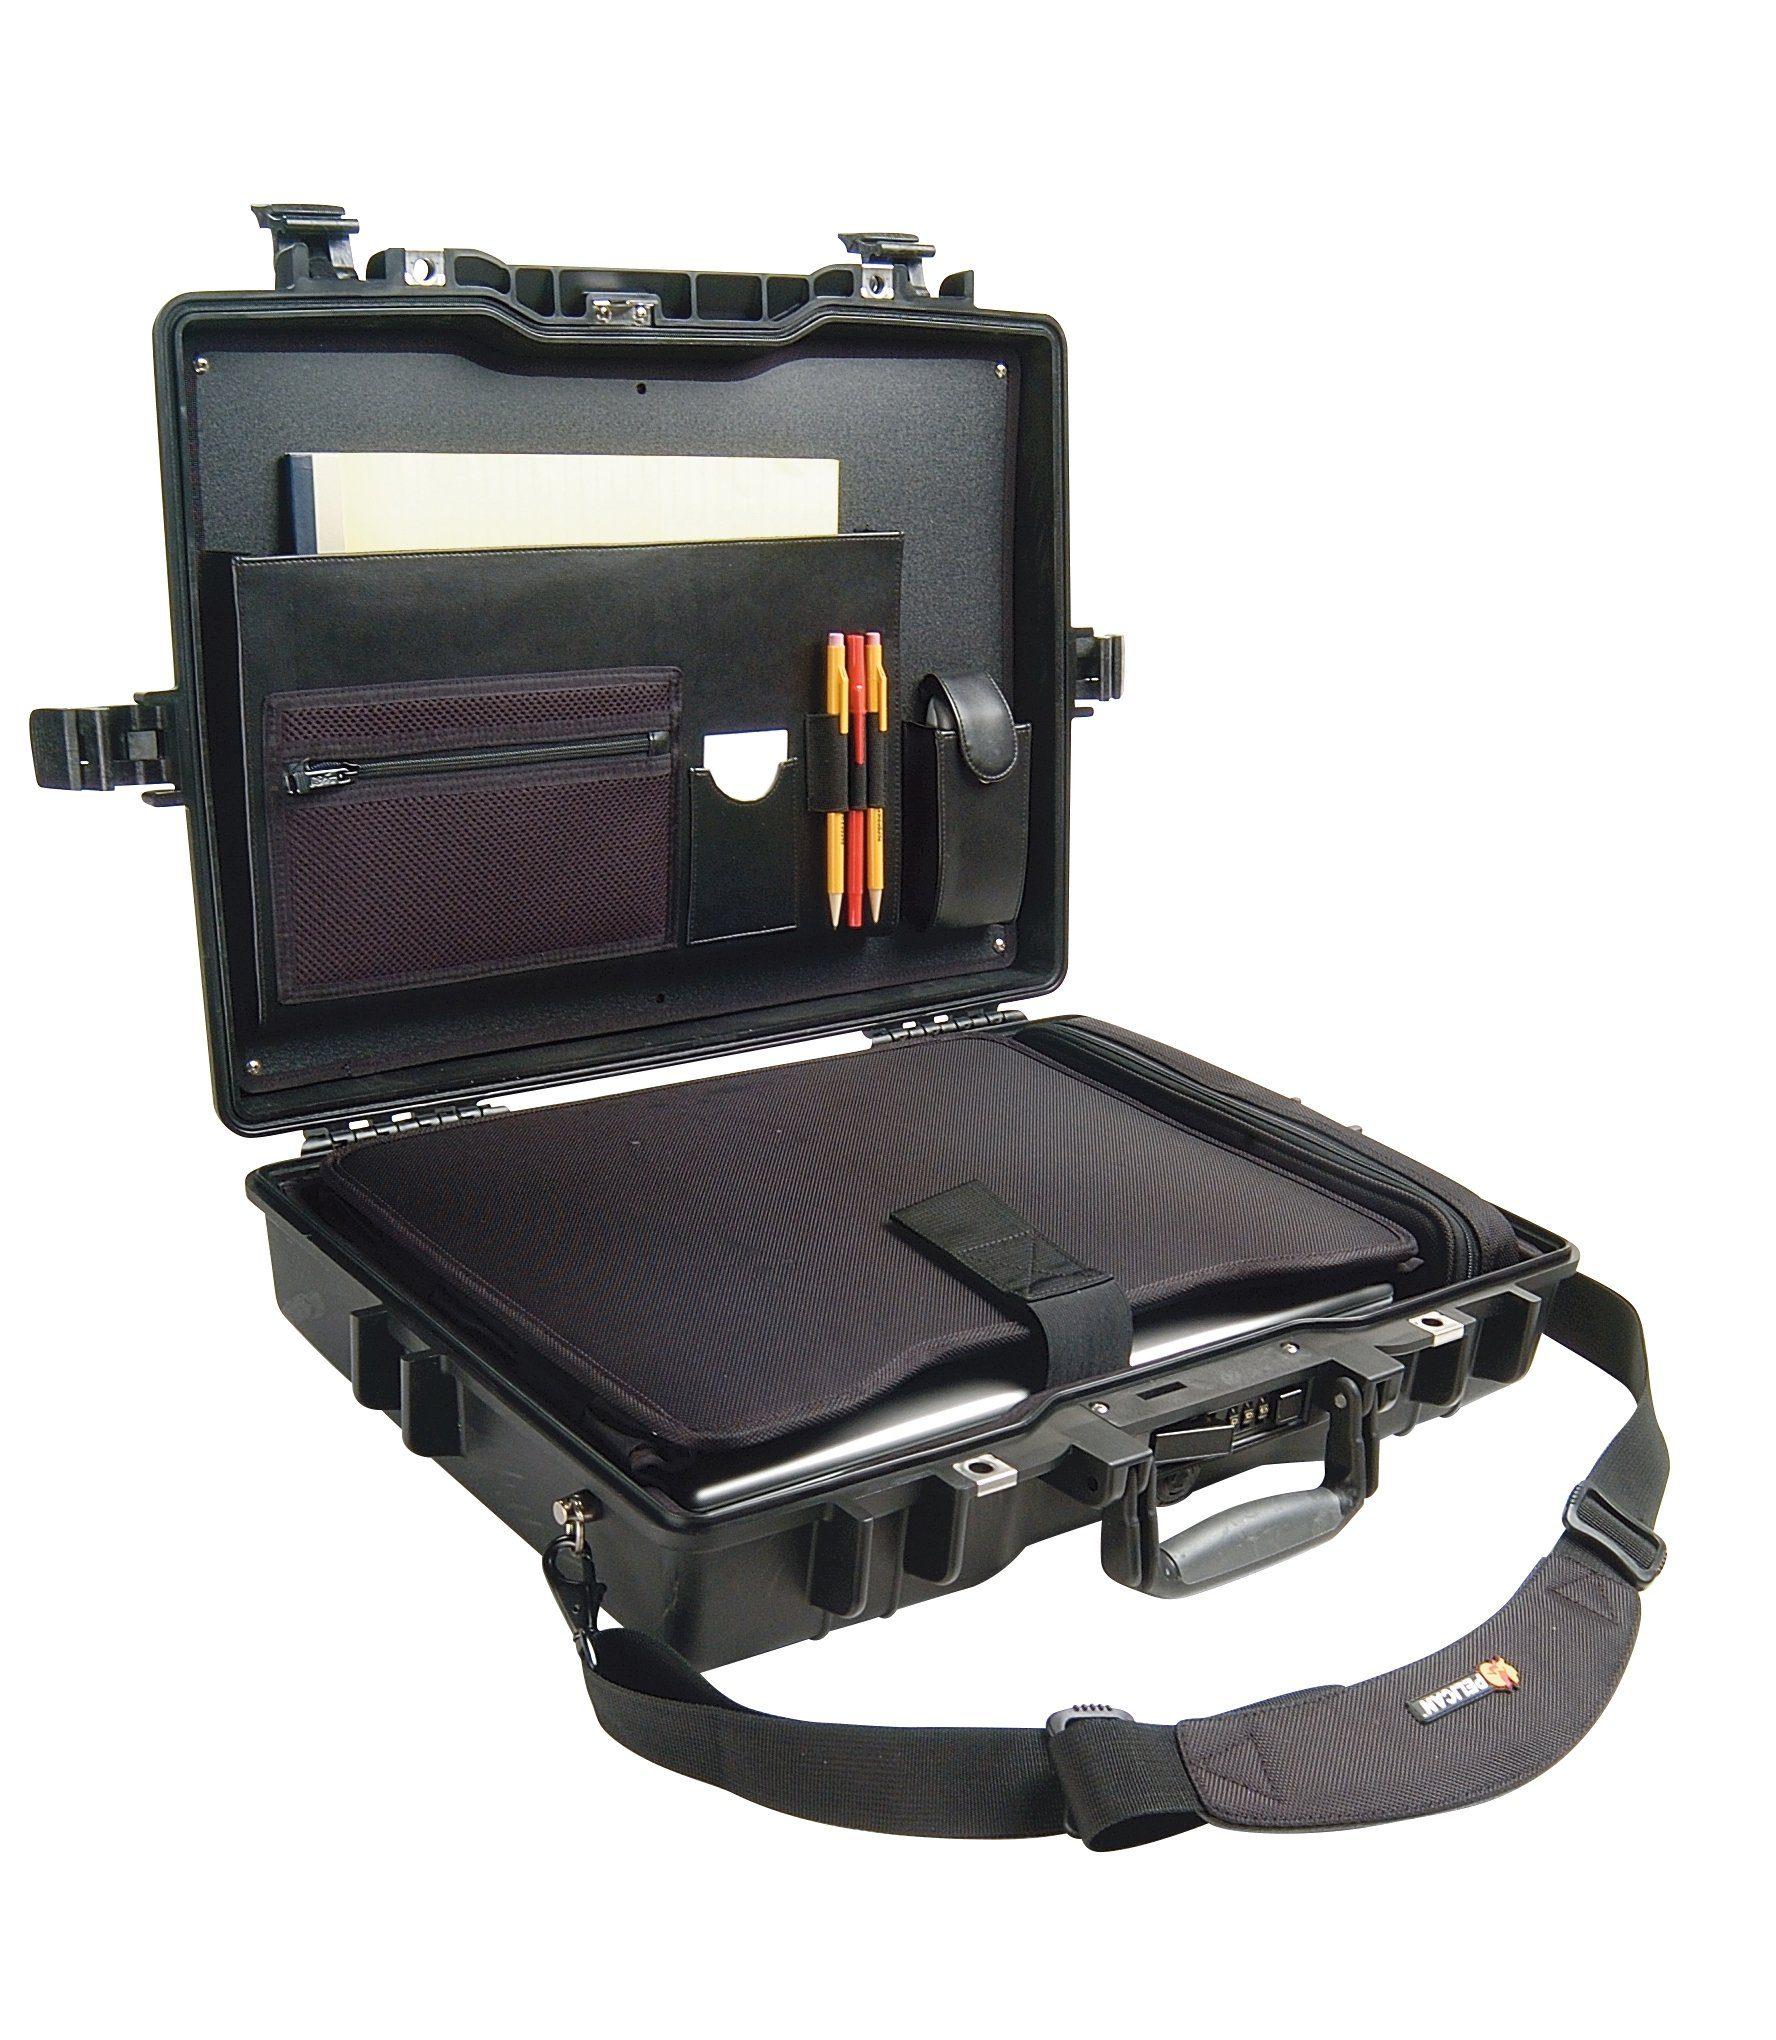 Peli Campingtruhe & -Kiste »1495 Laptop Computer Case DeLuxe«